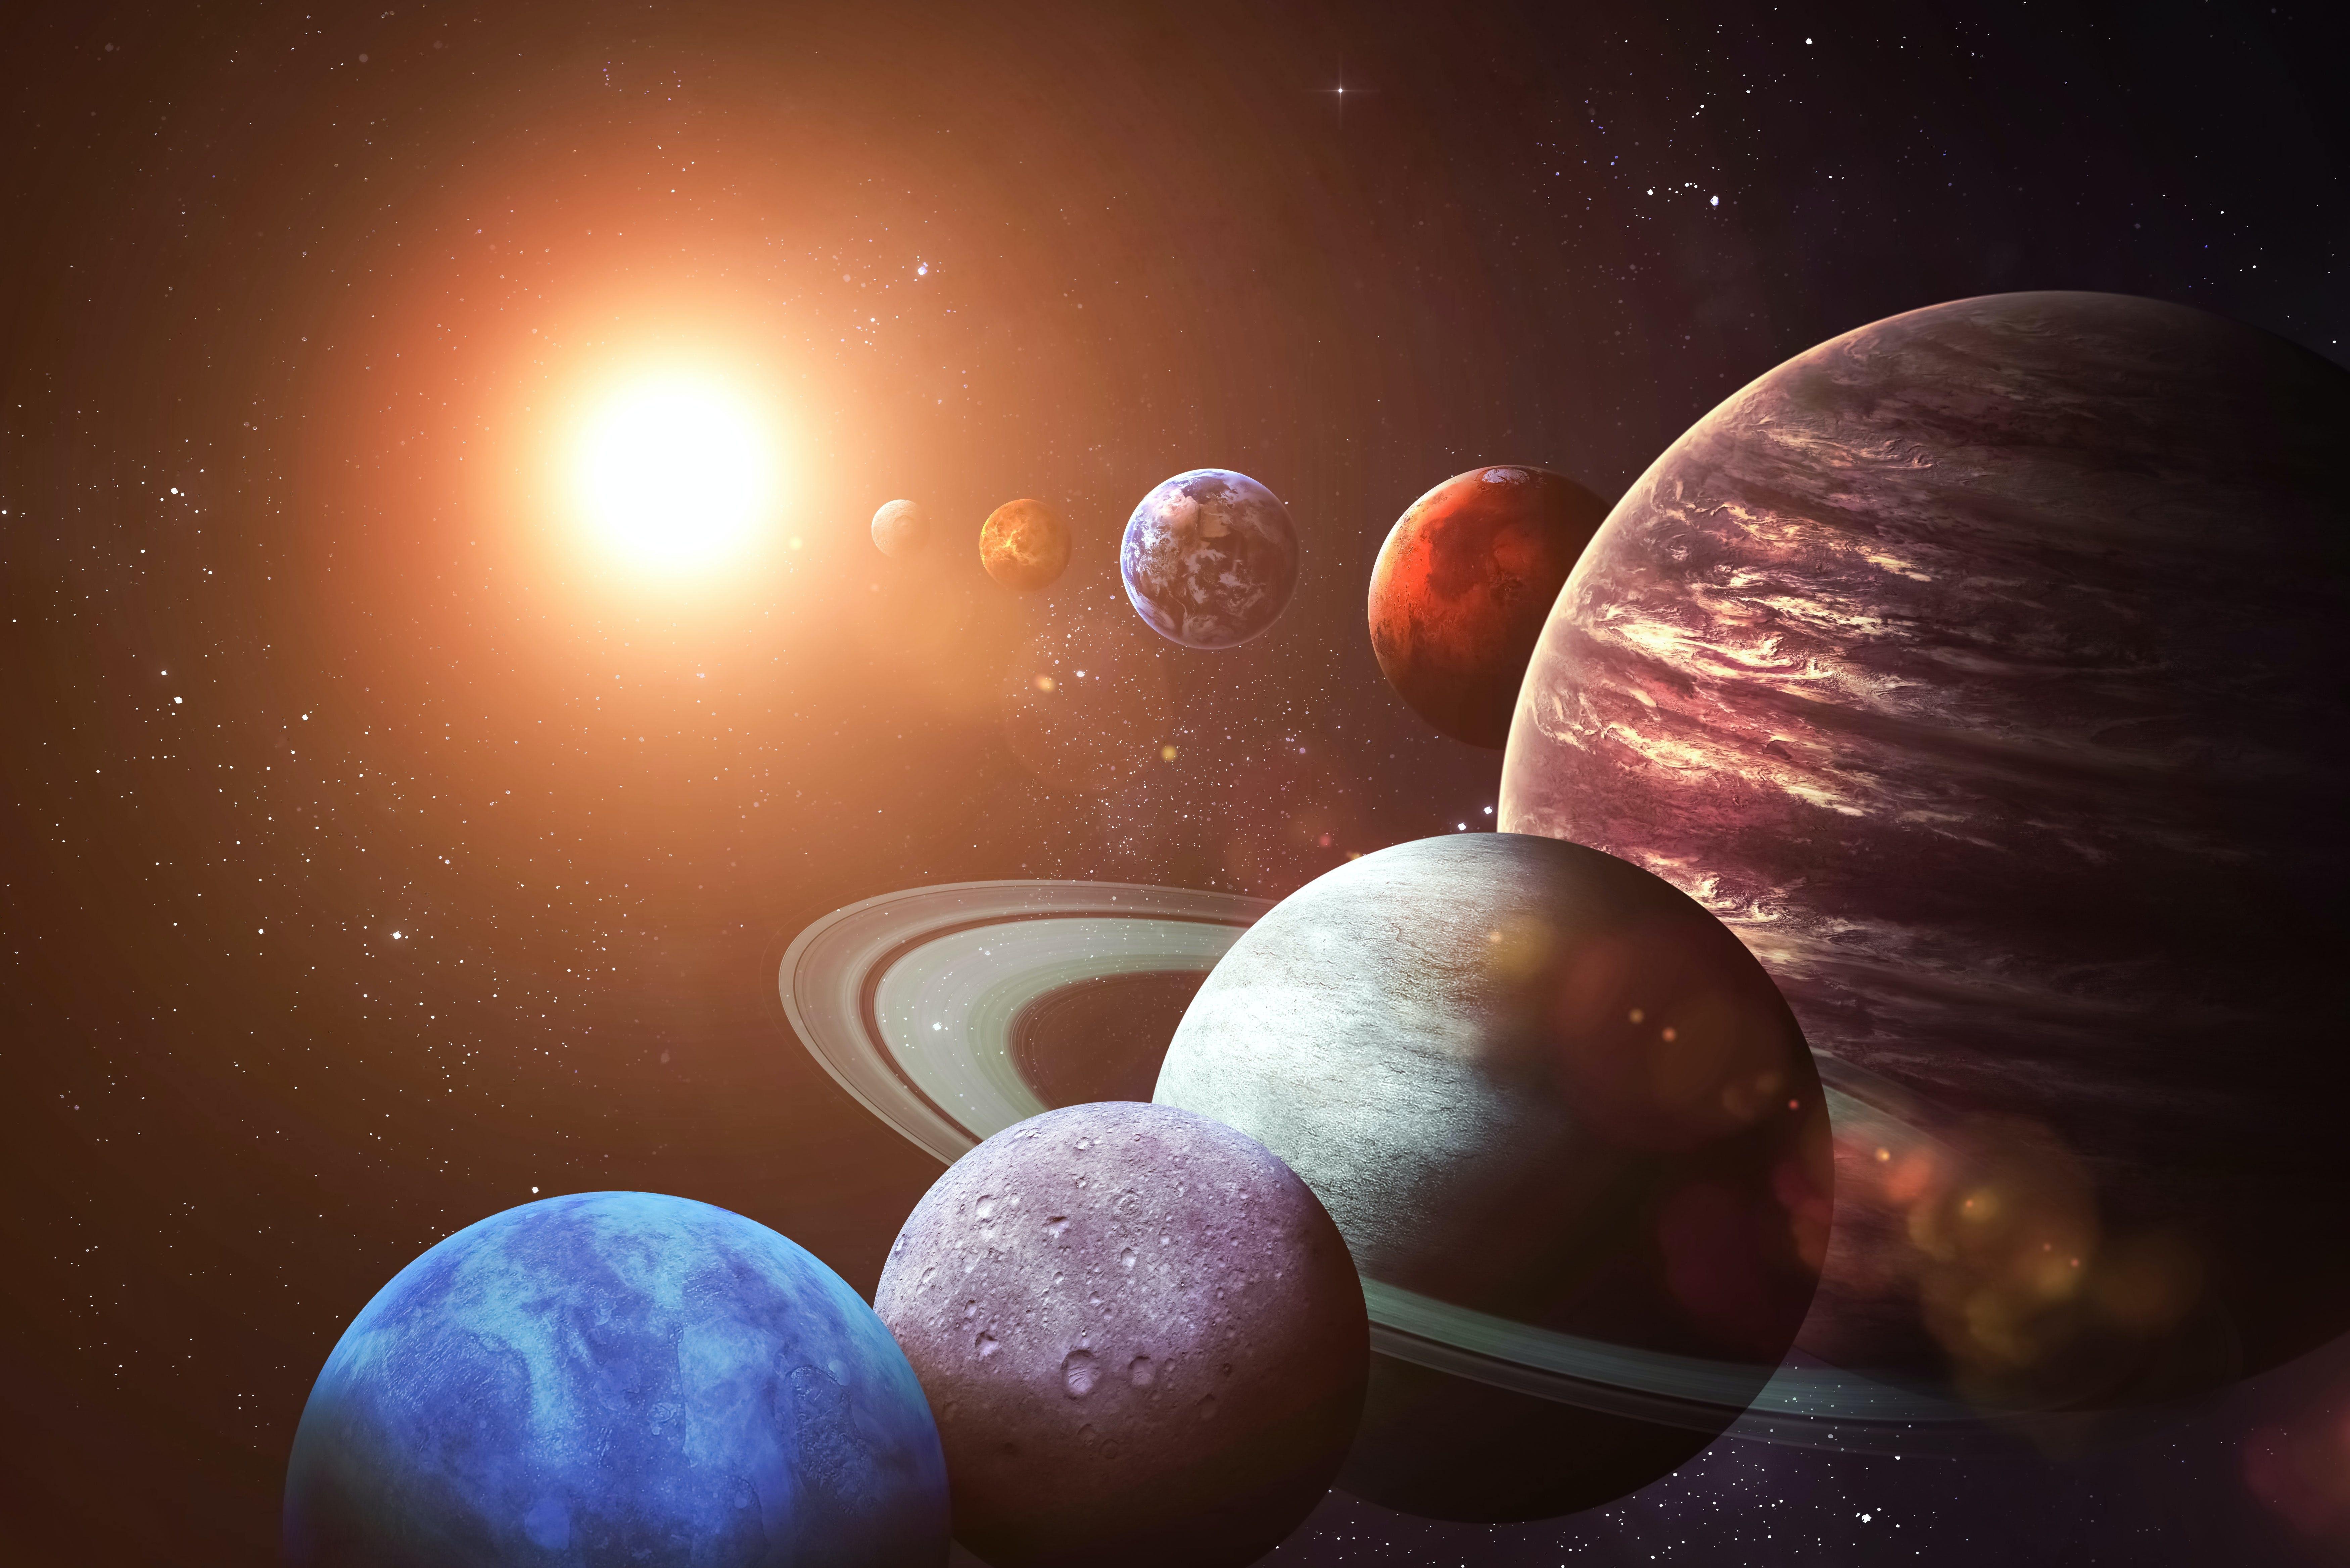 Solsystemet planeter